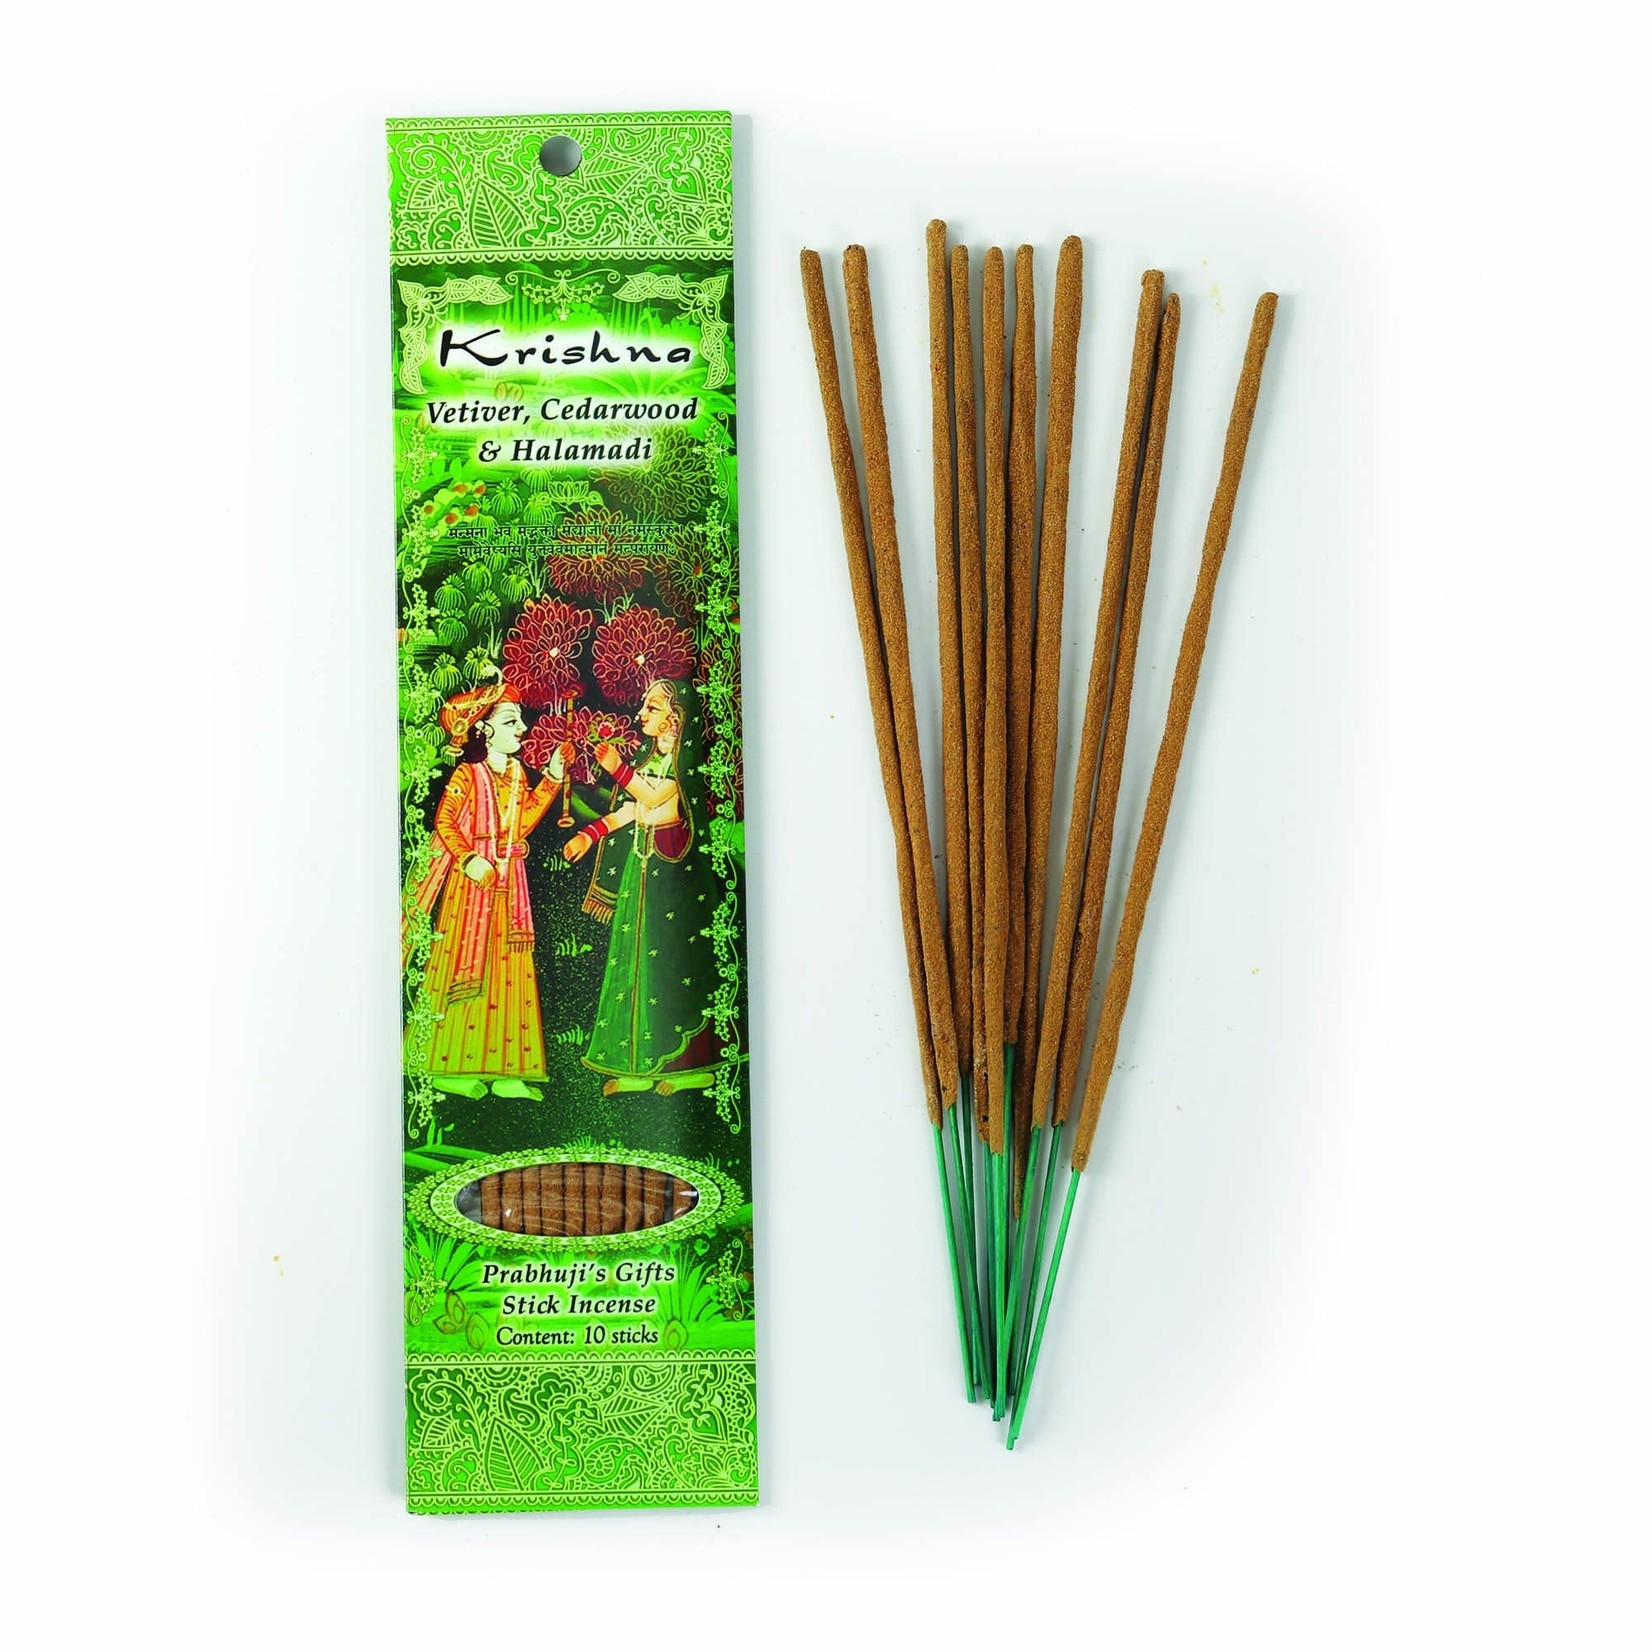 Prabhujis Gifts Krishna - Vetiver, Cedarwood, Halamadi Incense Sticks